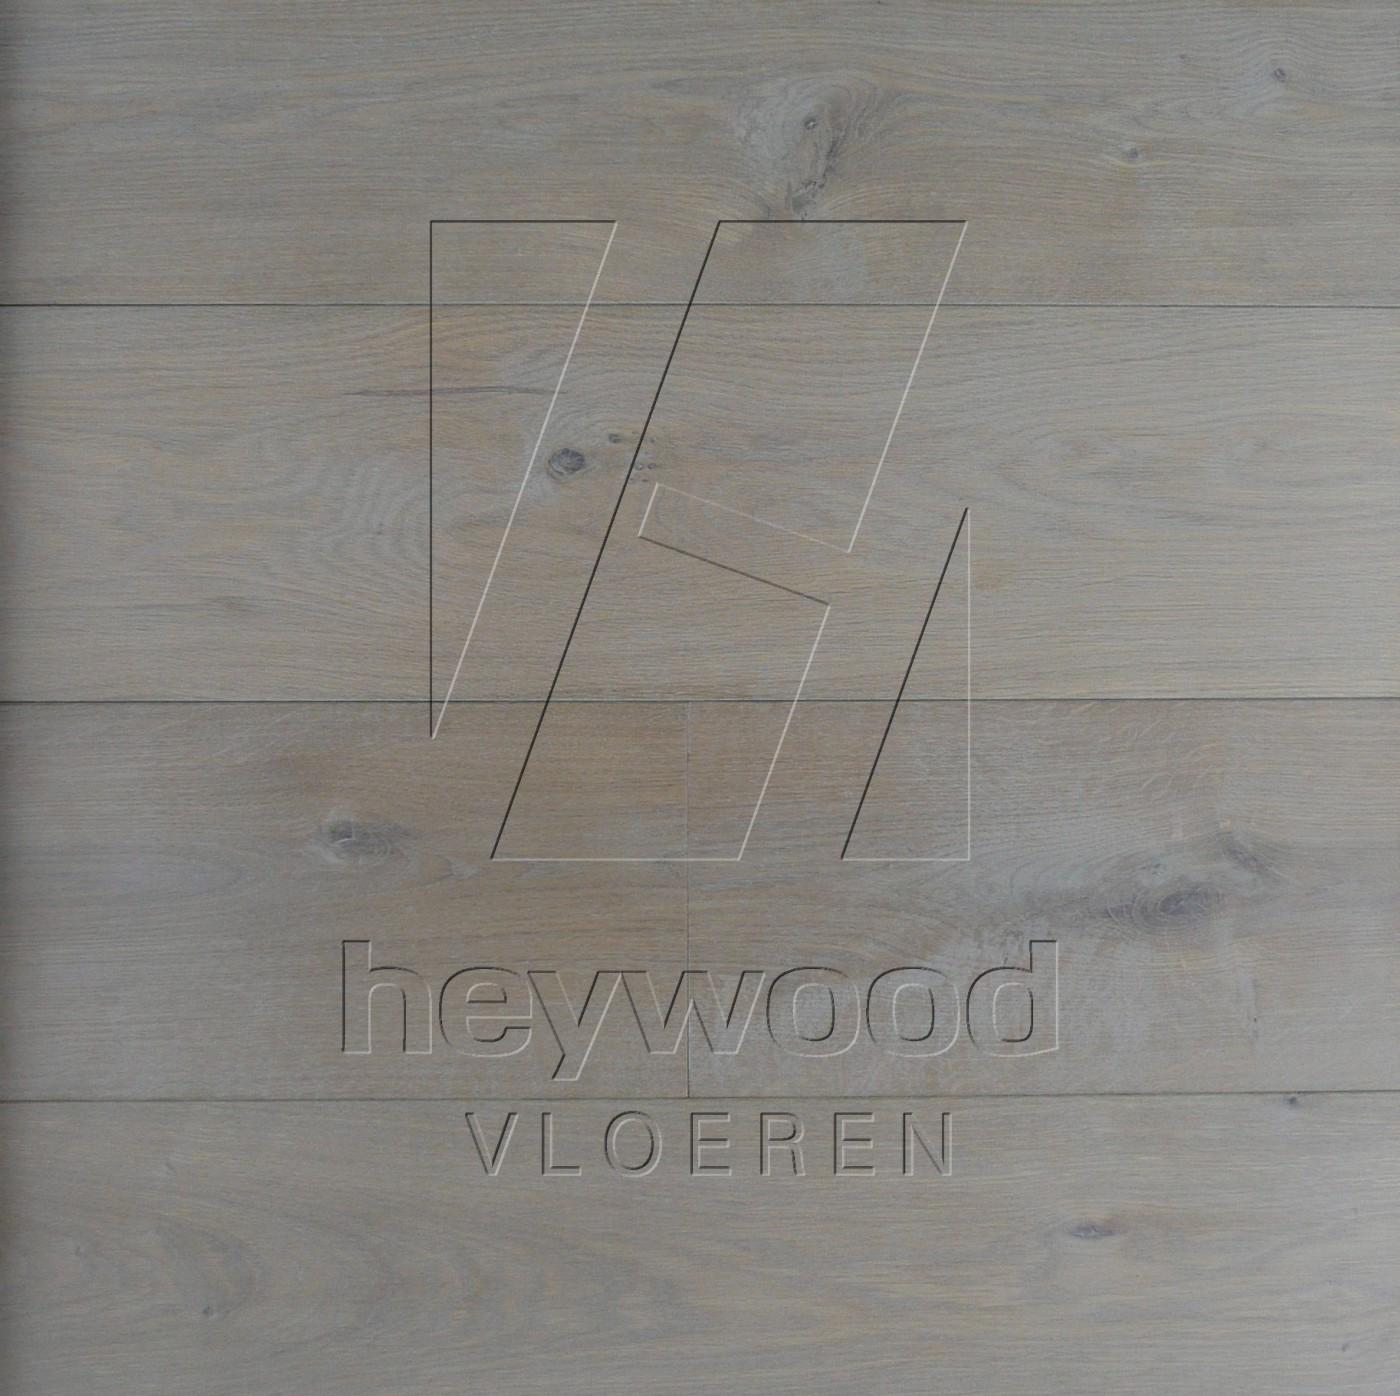 Prague in European Oak Character of Bespoke Wooden Floors